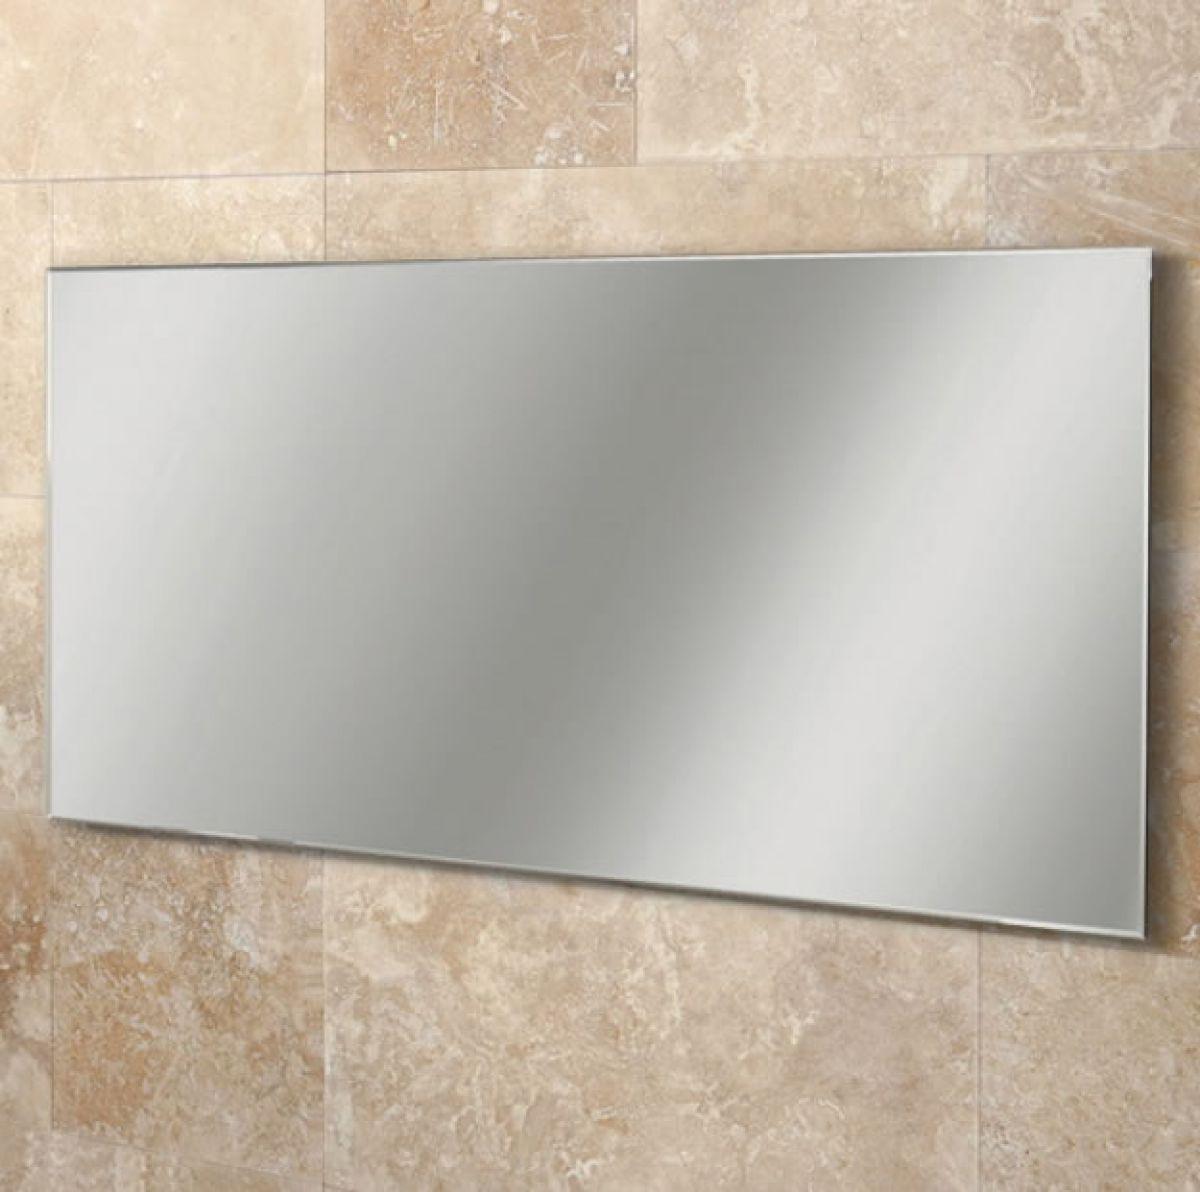 Bathroom wall mirrors uk - Latest Posts Under Bathroom Mirror Cabinets